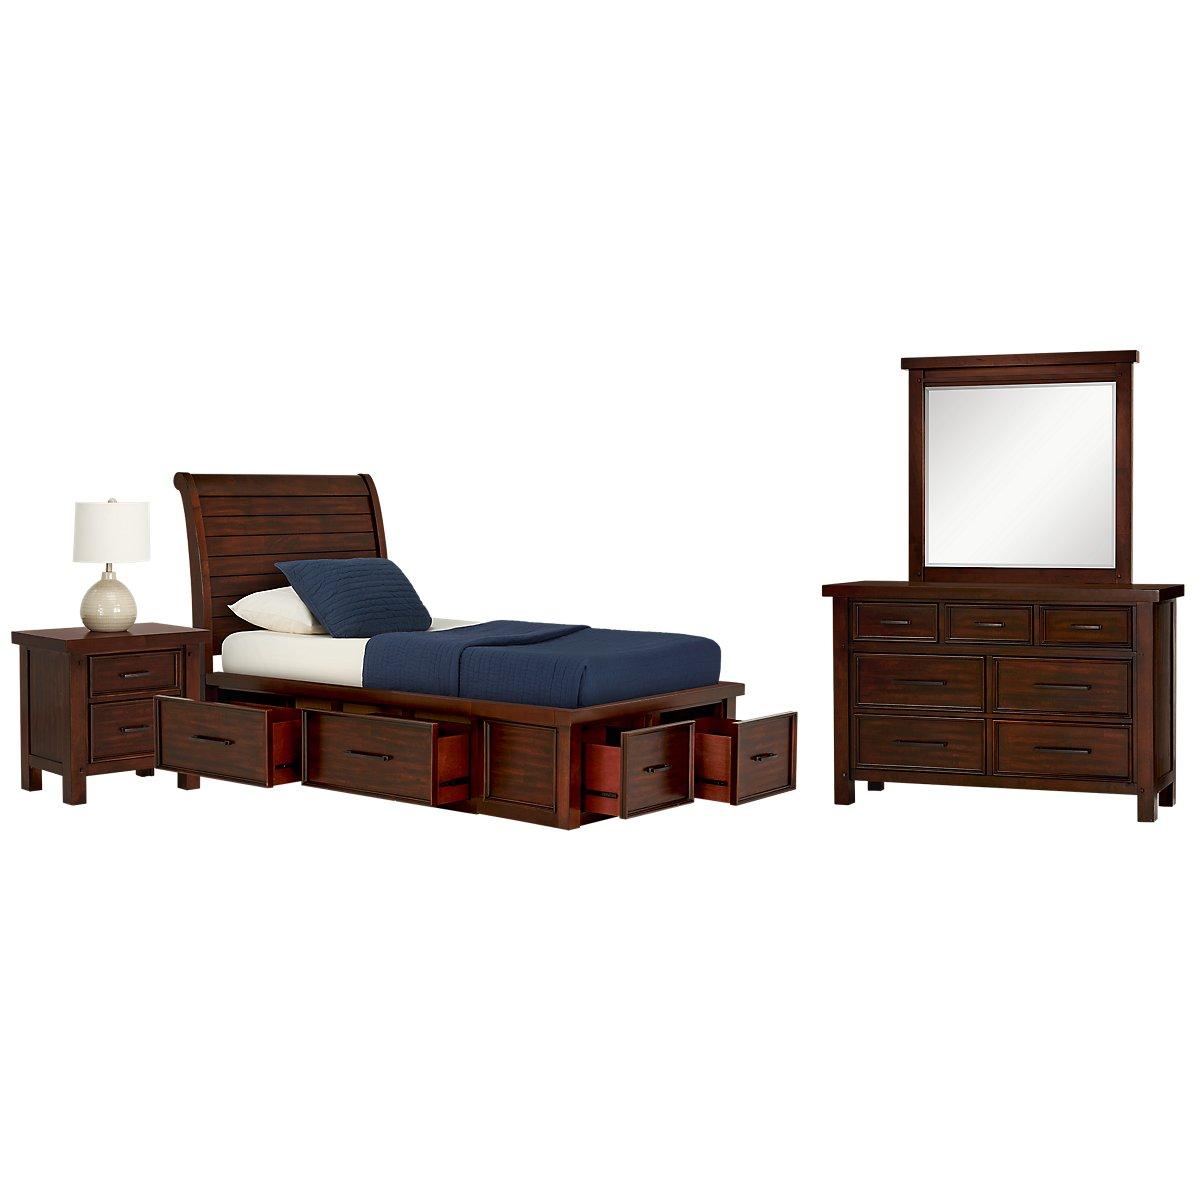 City furniture napa dark tone sleigh storage bedroom for Napa valley bedroom furniture